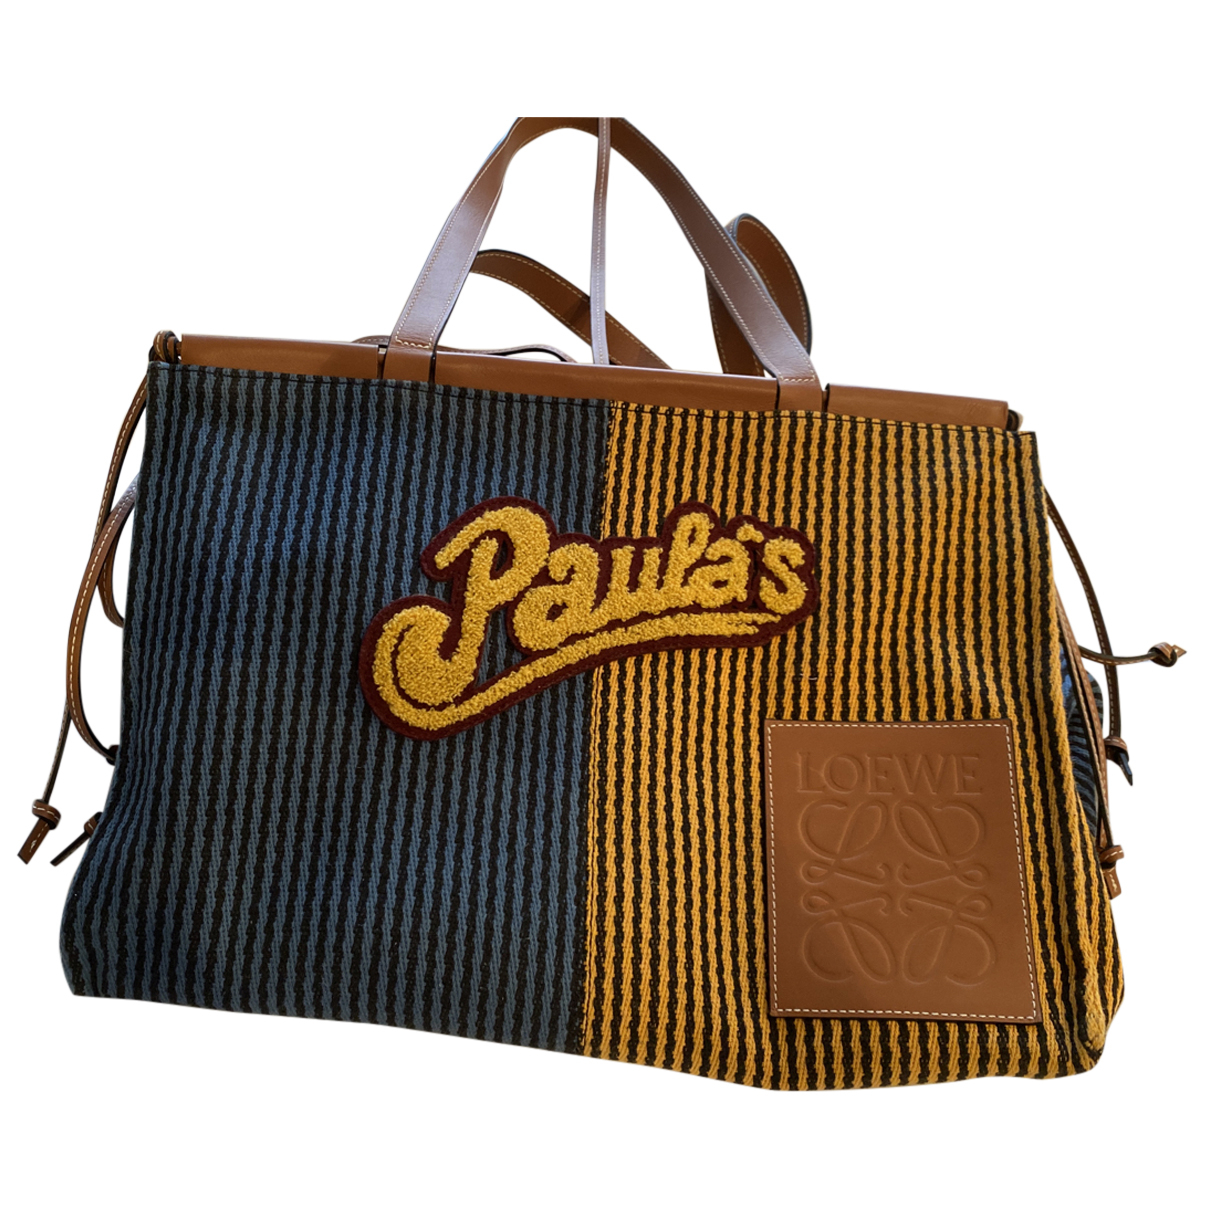 Loewe N Blue Cloth Travel bag for Women N